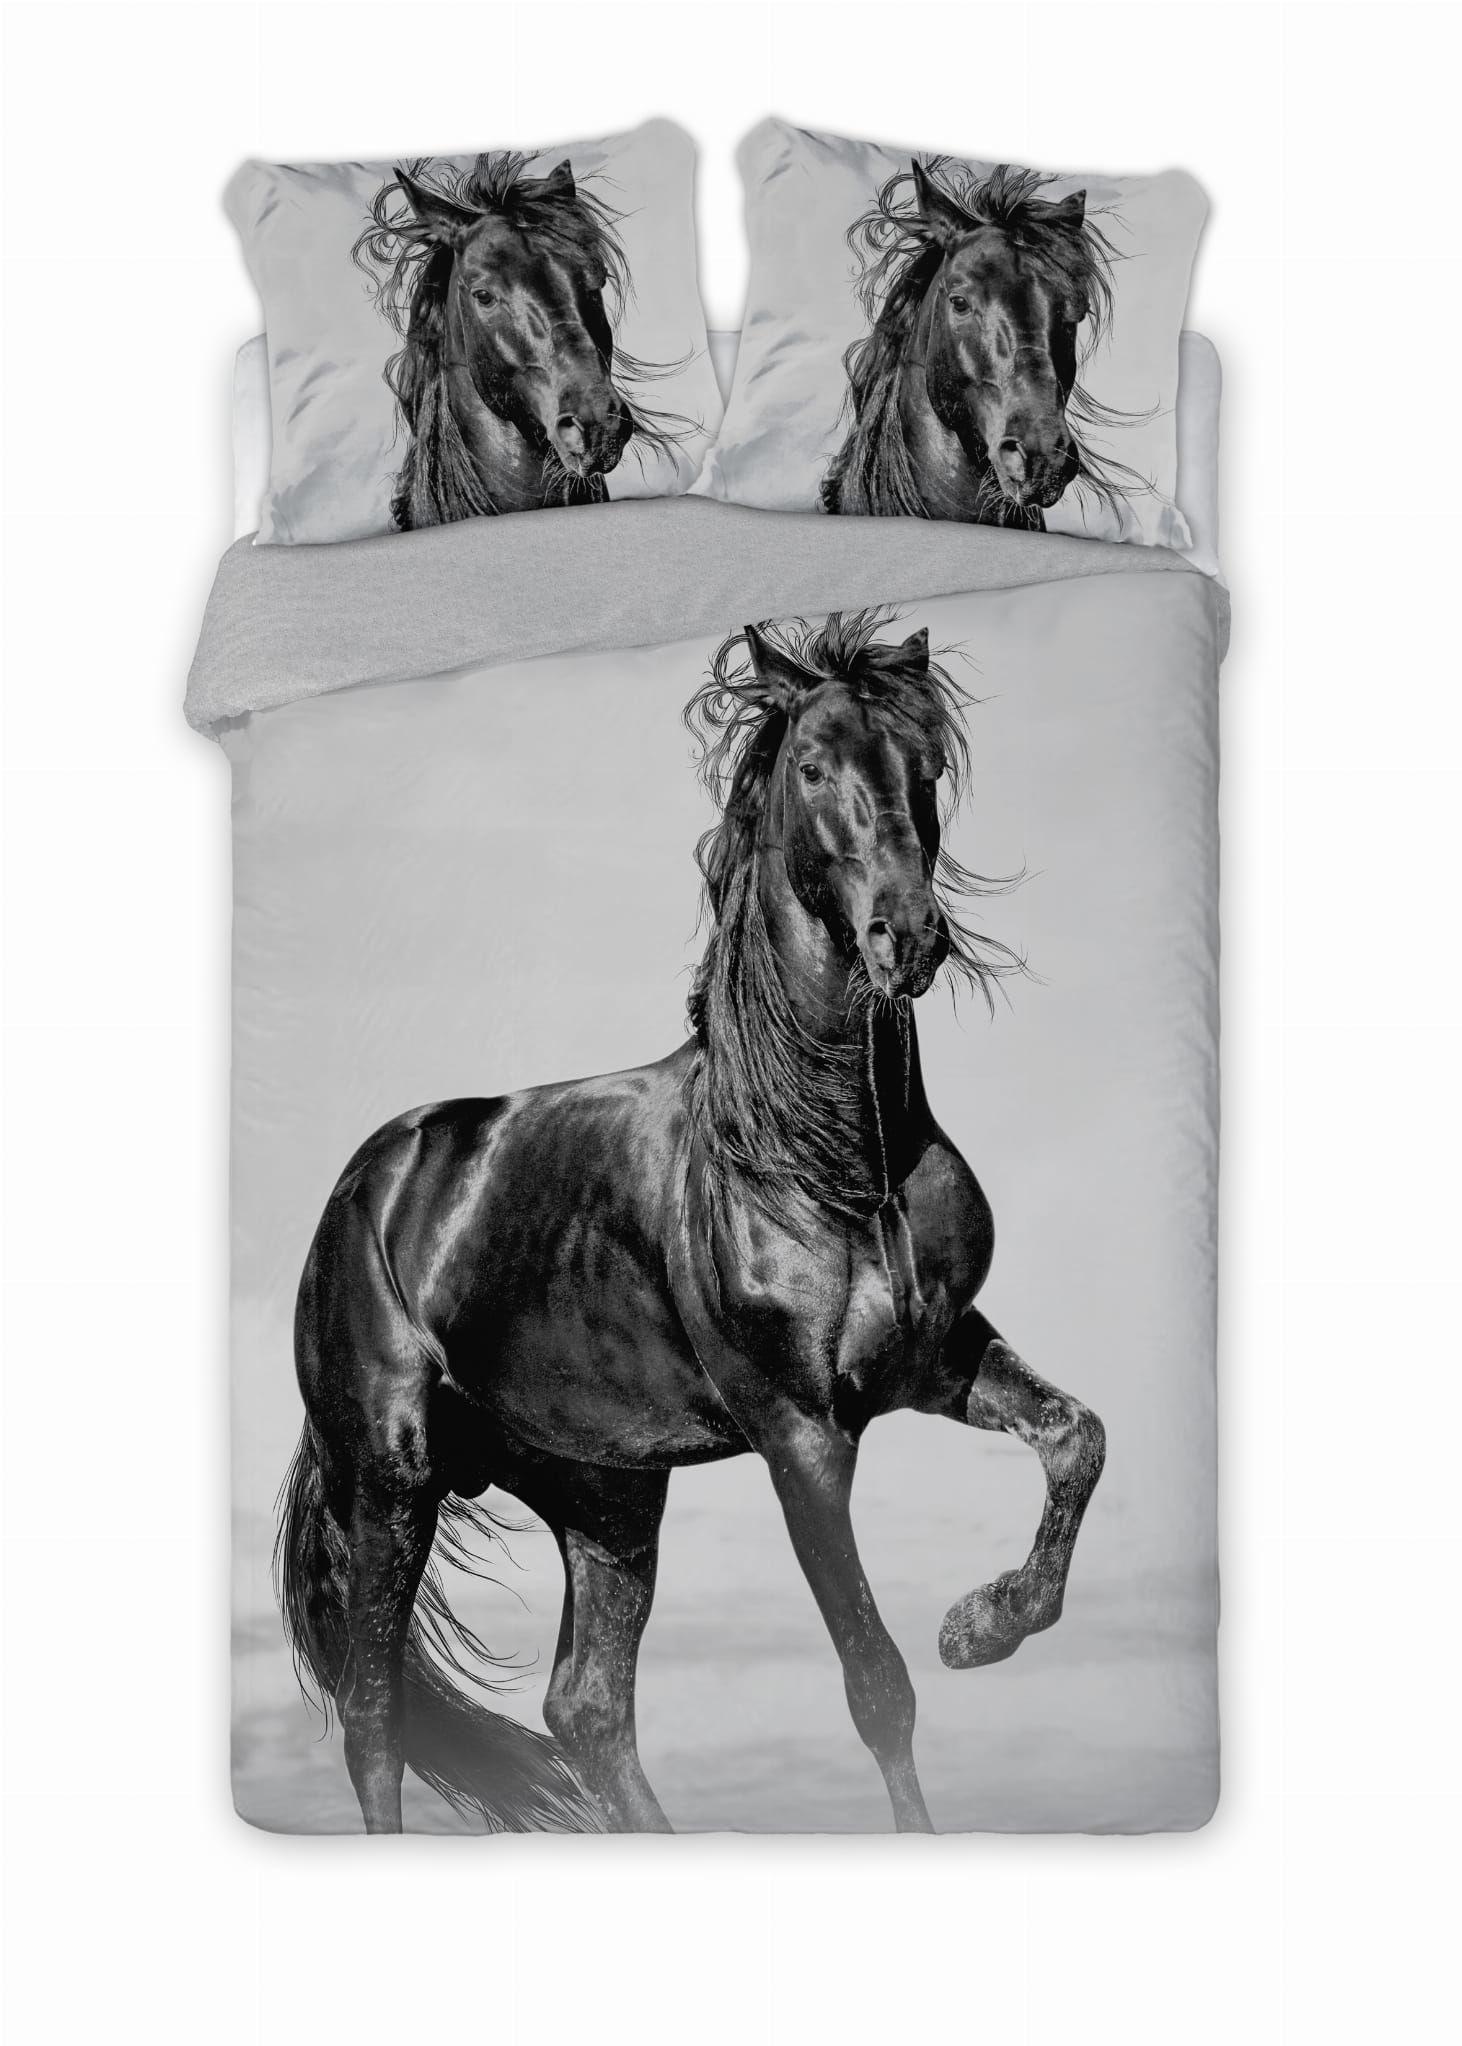 Pościel ekskluzywna perkal 160x200 Koń Mustang